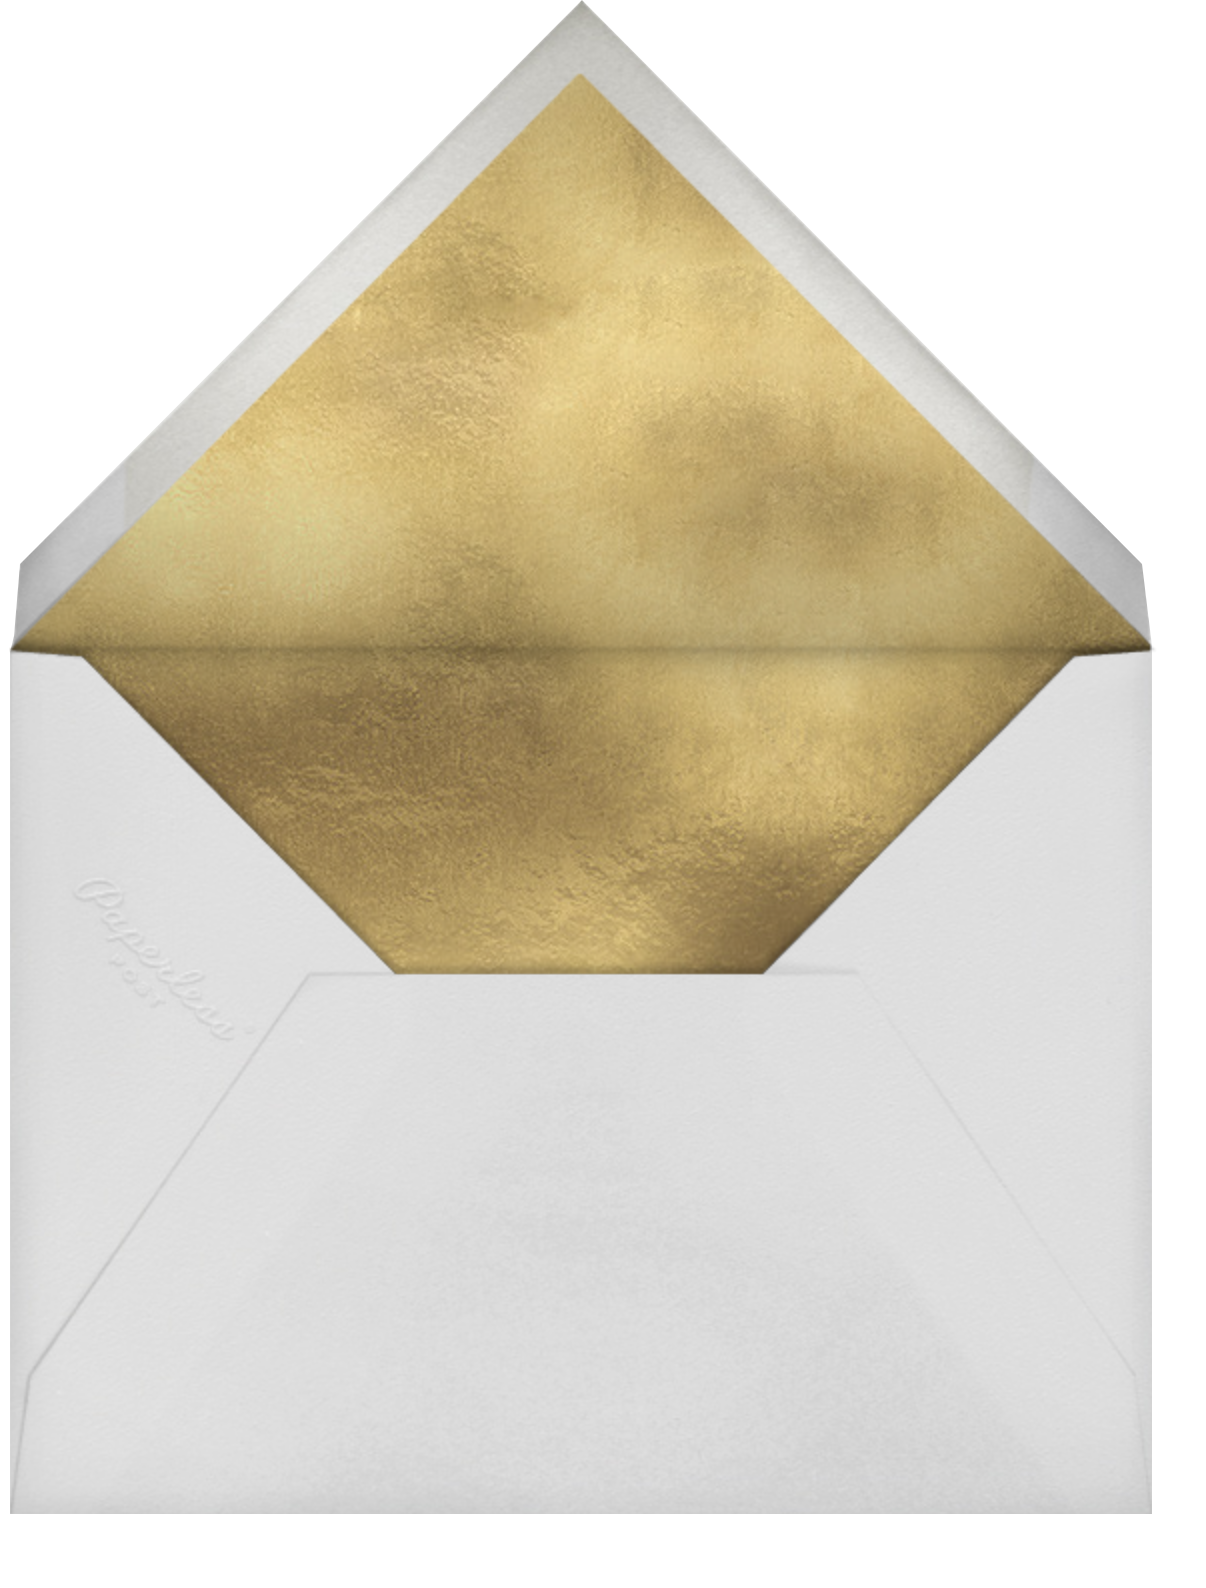 Kissapöllö - White - Marimekko - Professional events - envelope back